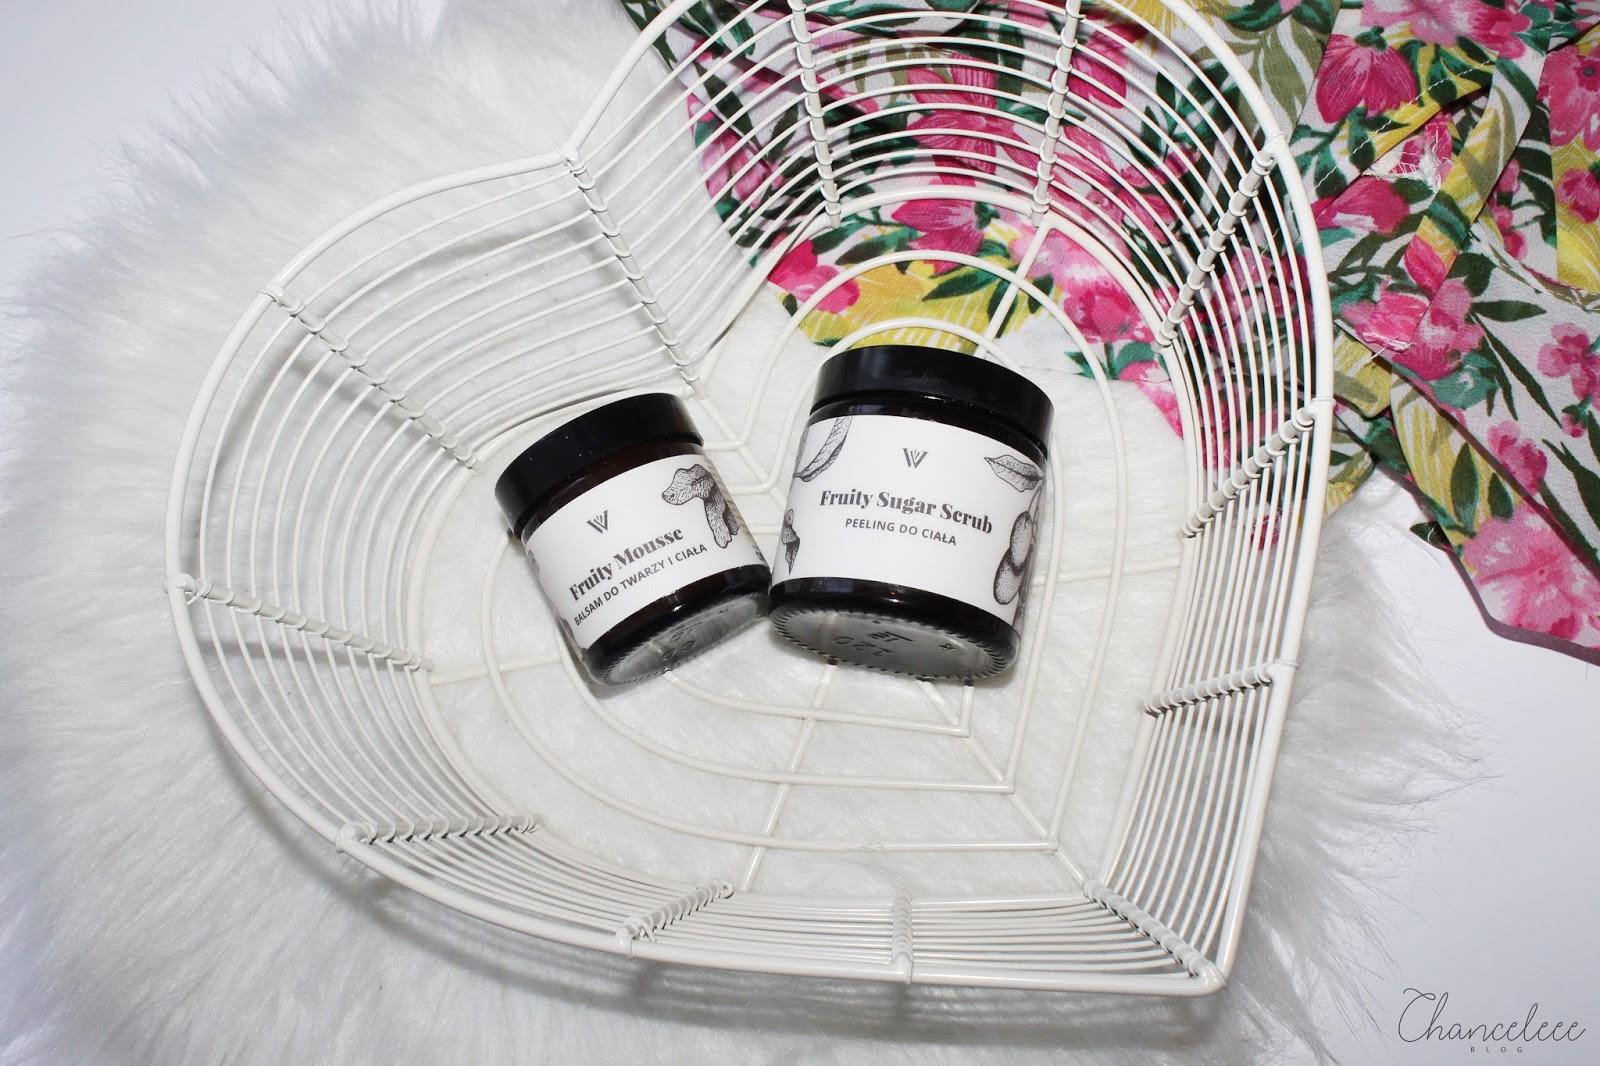 willow organics kosmetyki